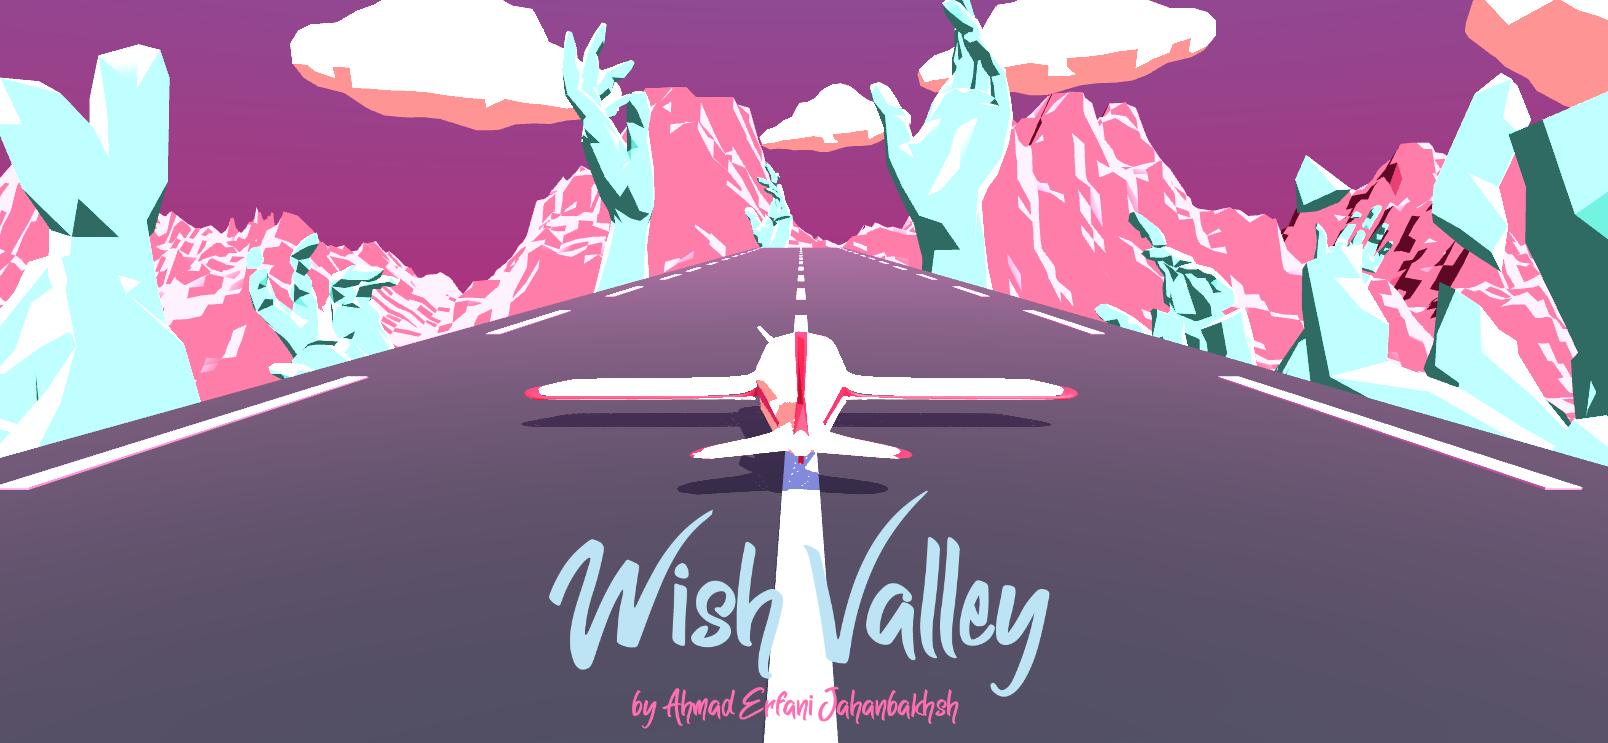 Wish Valley